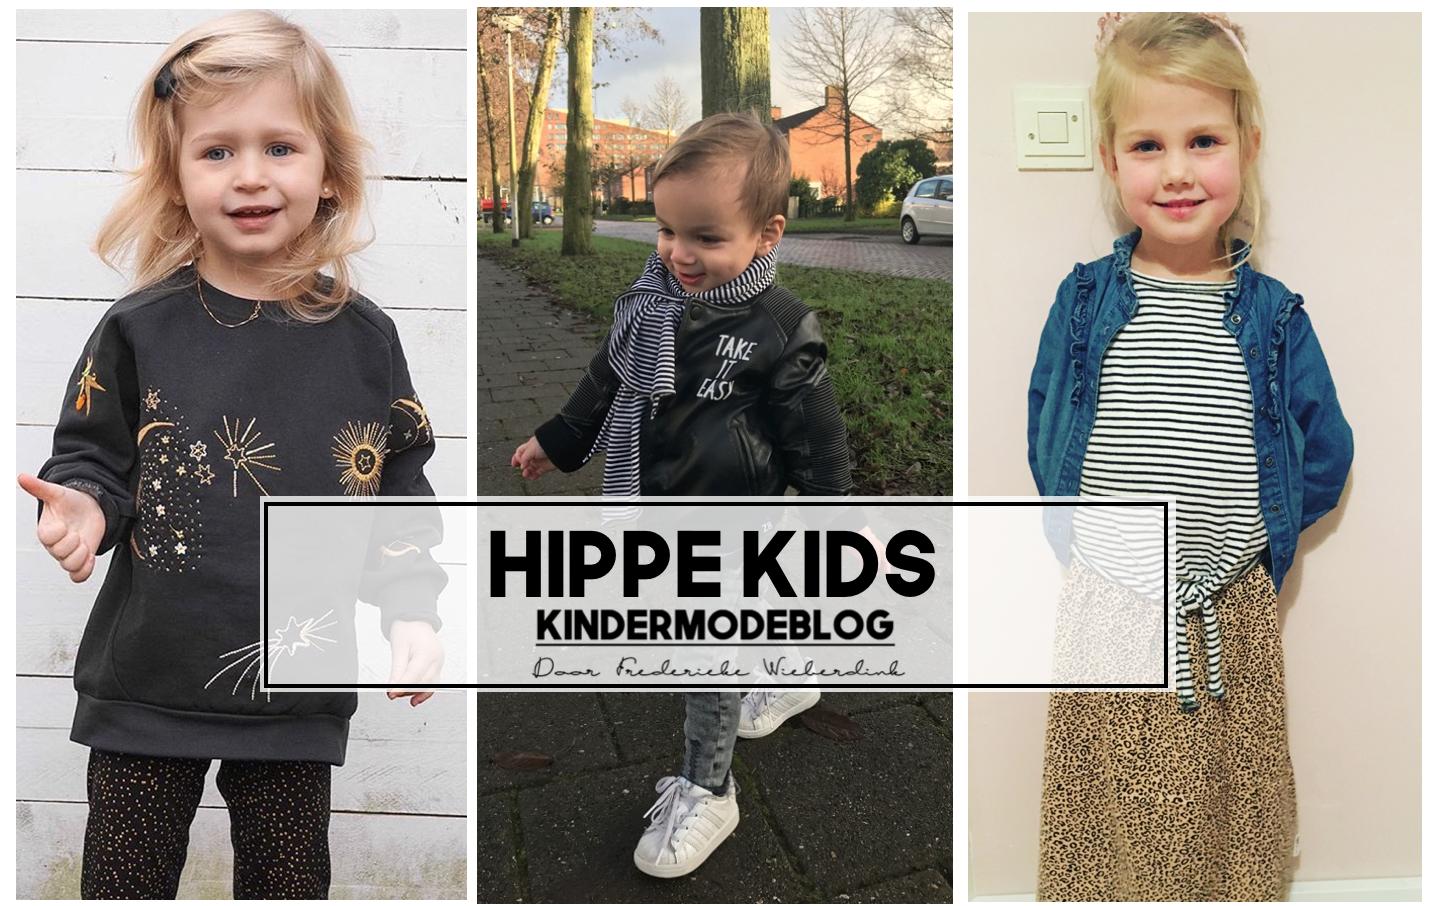 HIPPE KIDS KINDERKLEDING INSPIRATIE 22/12